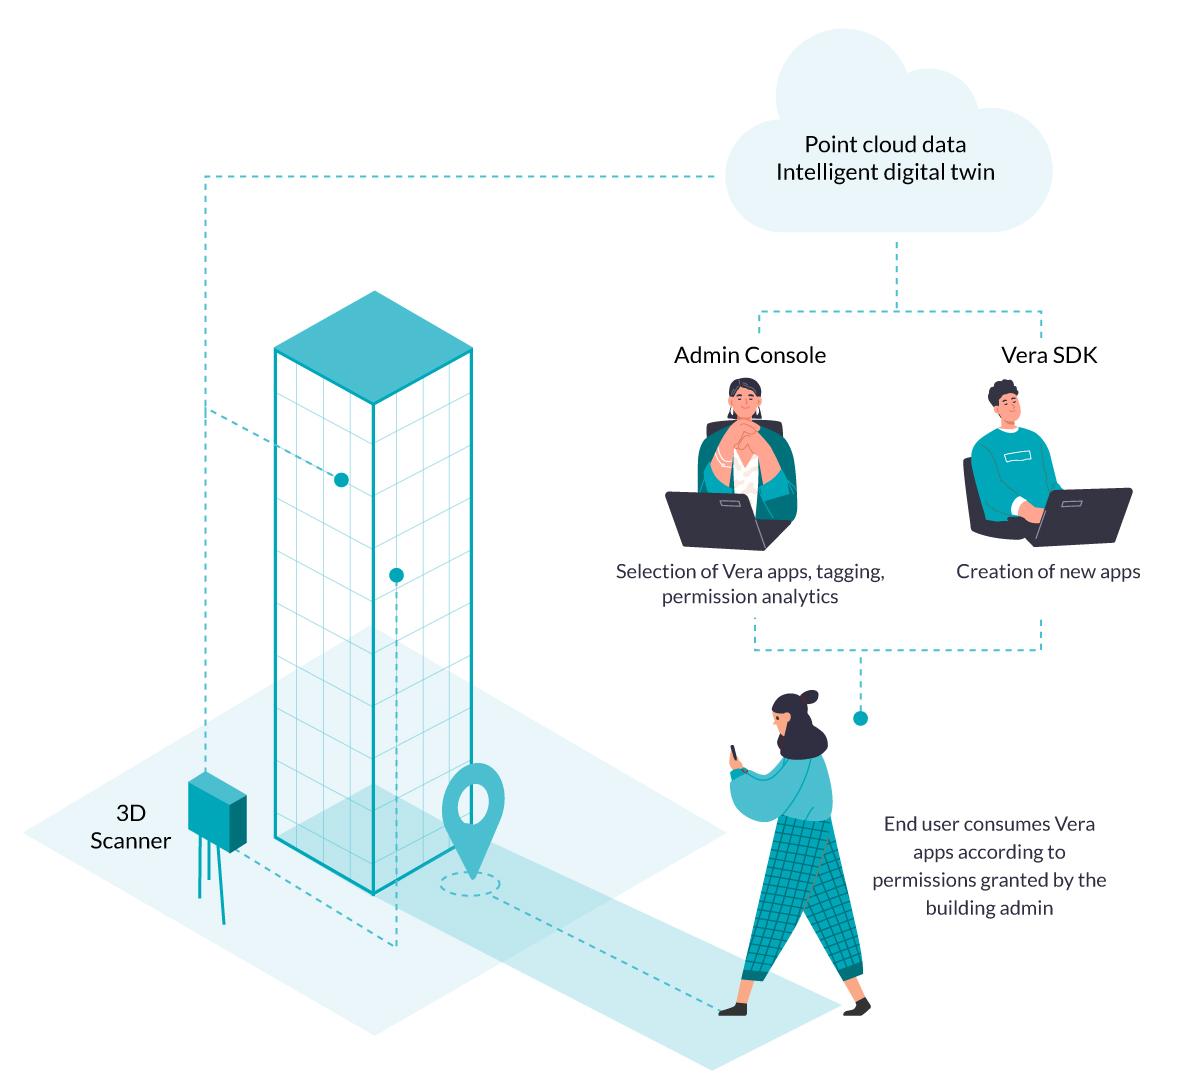 Advance AI and AR